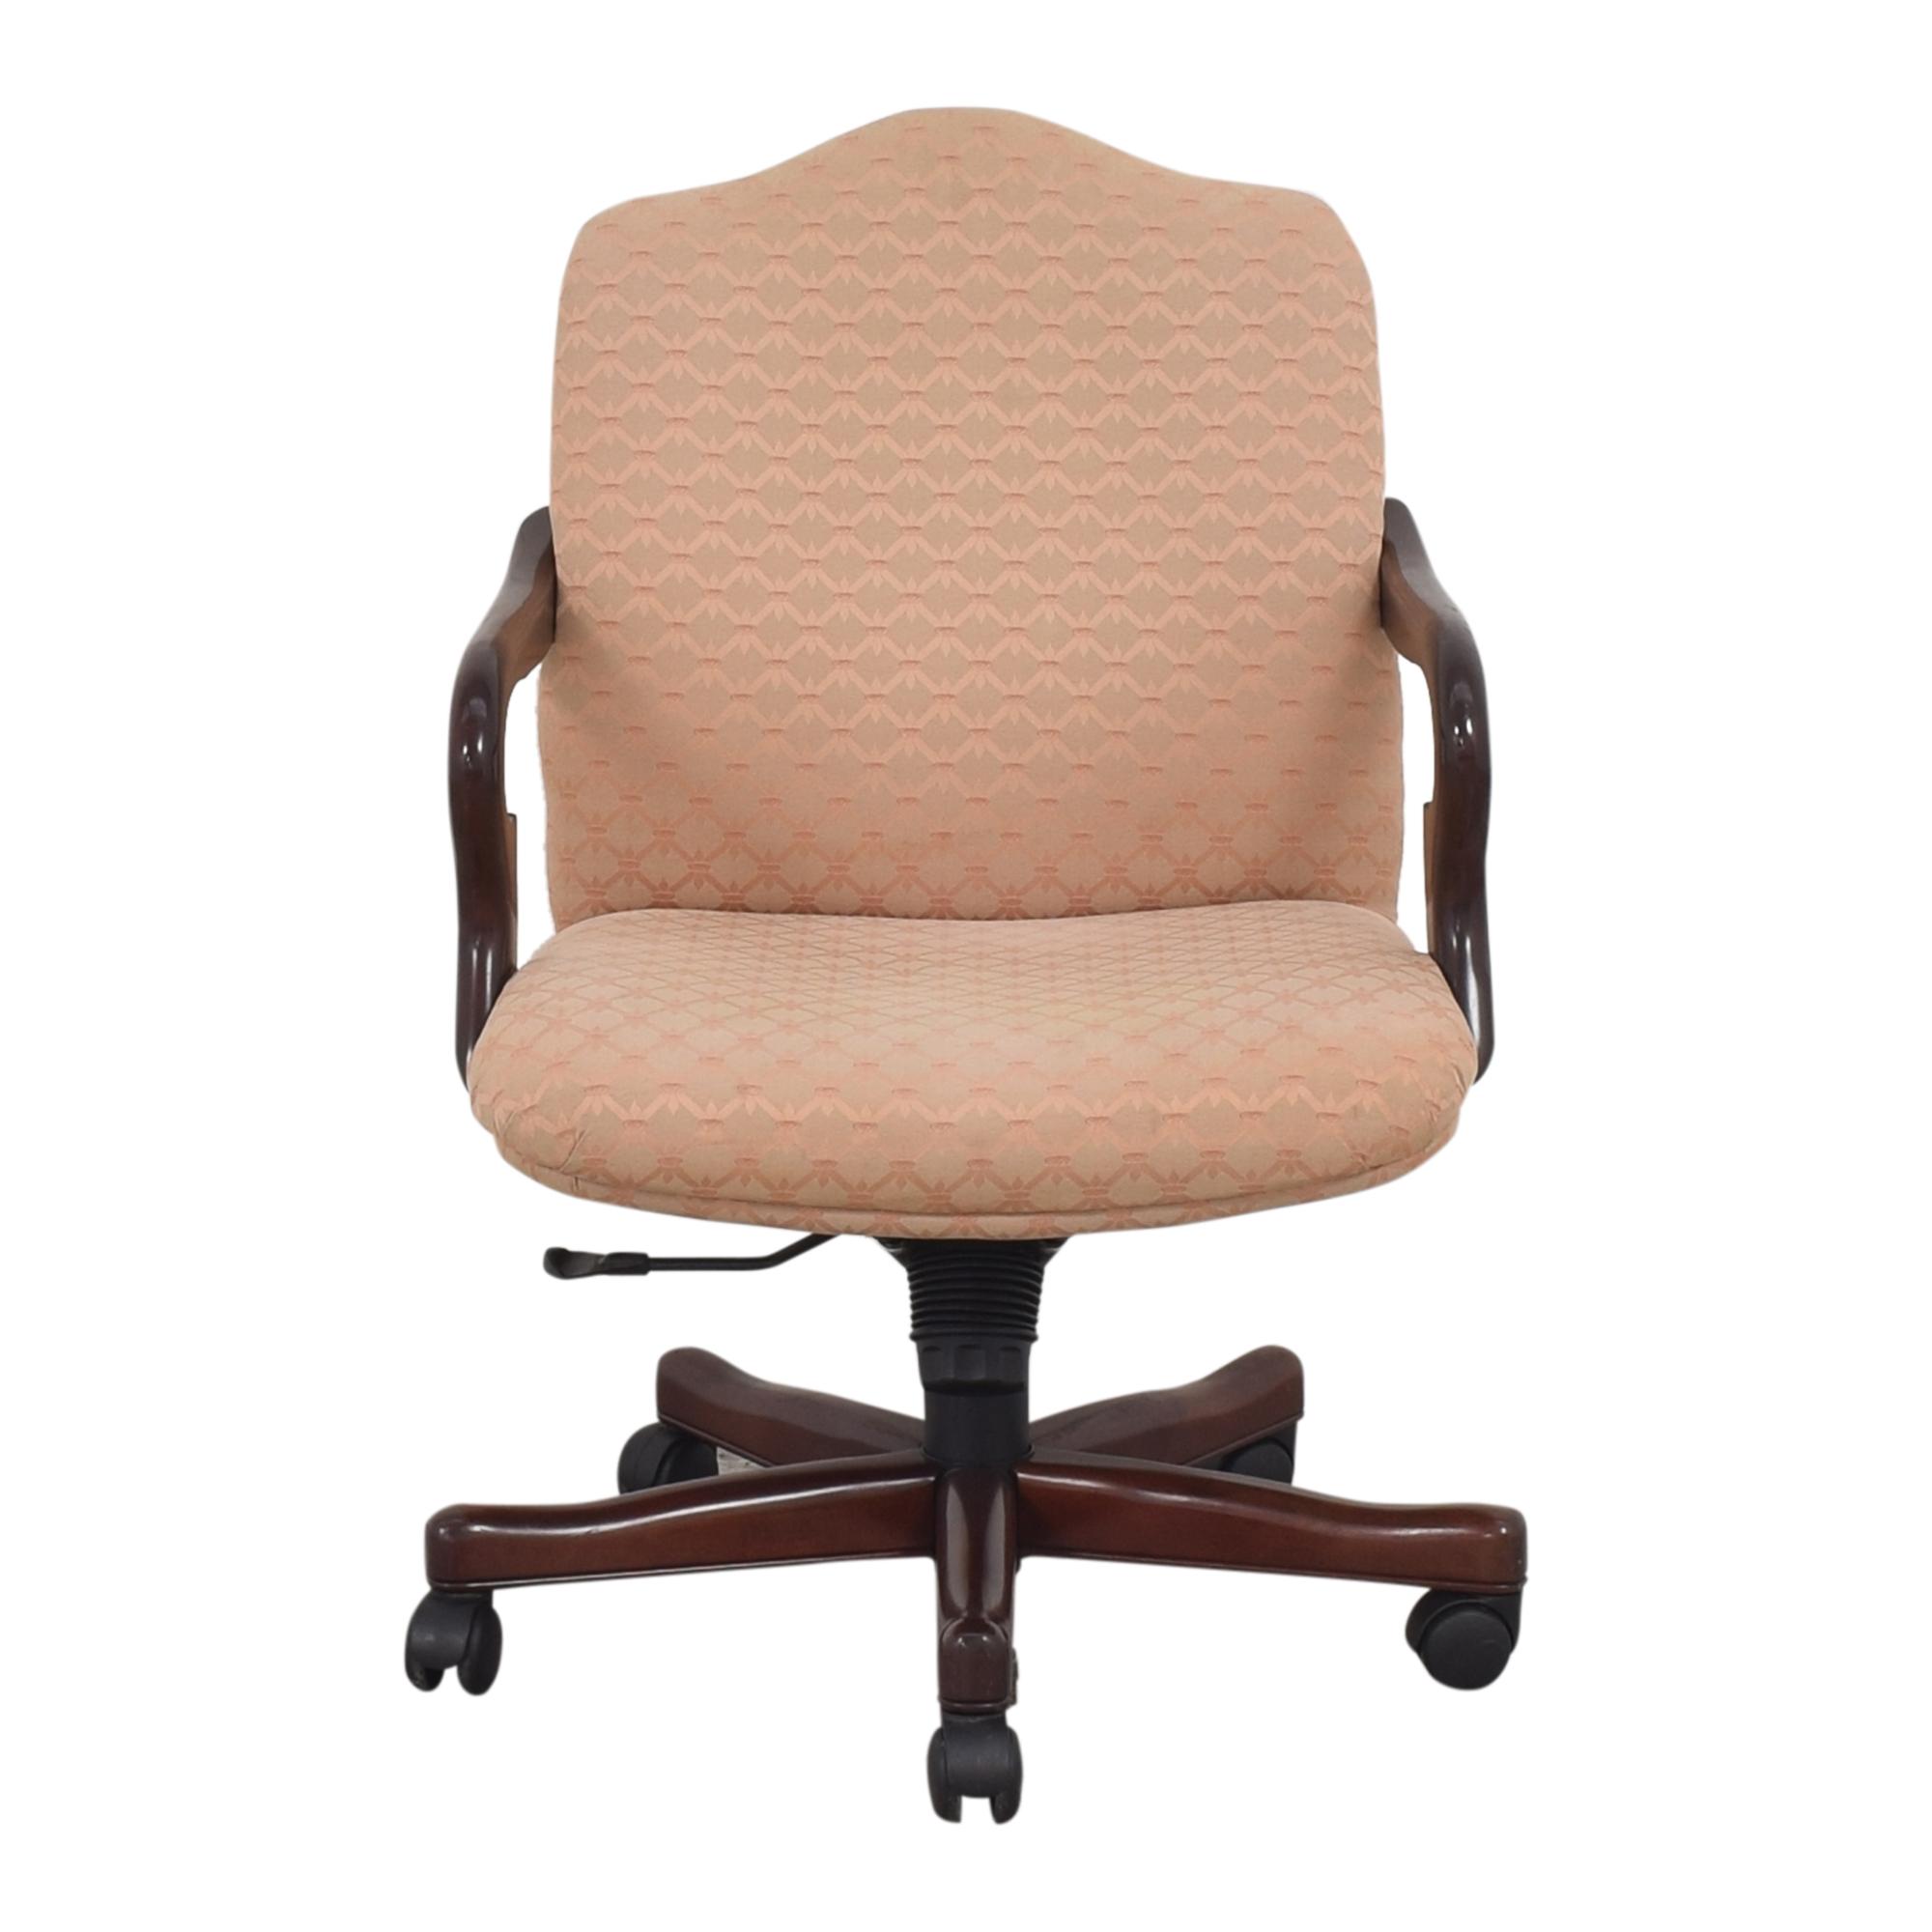 Jofco Jofco Swivel Tilt Office Chair